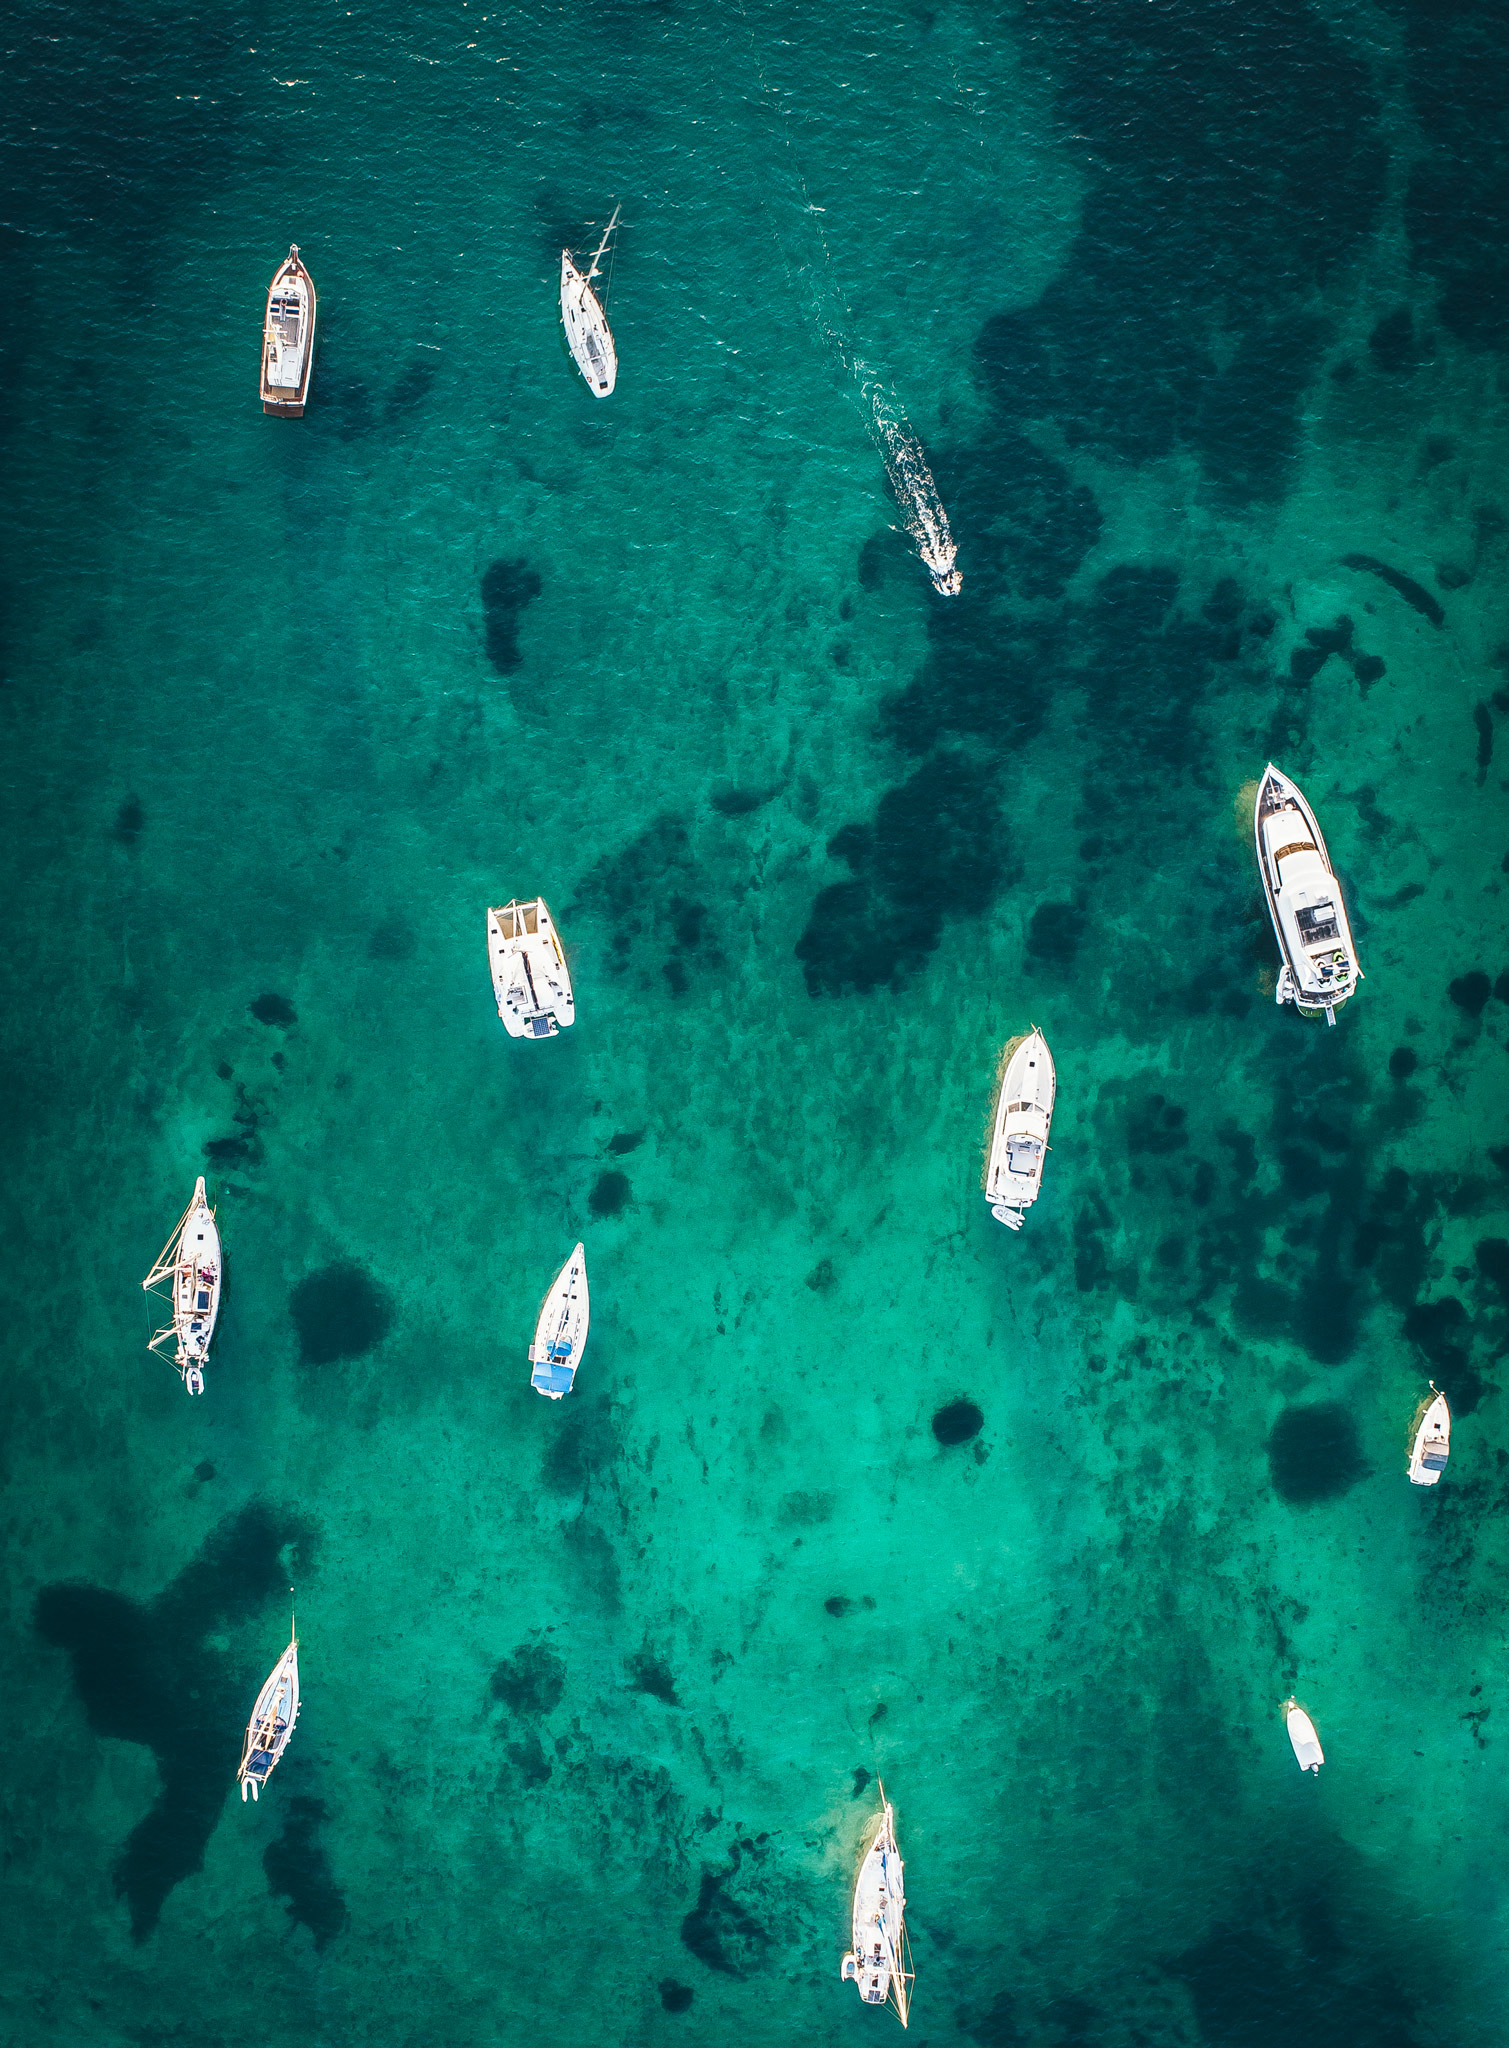 BoatsMallorca.jpg